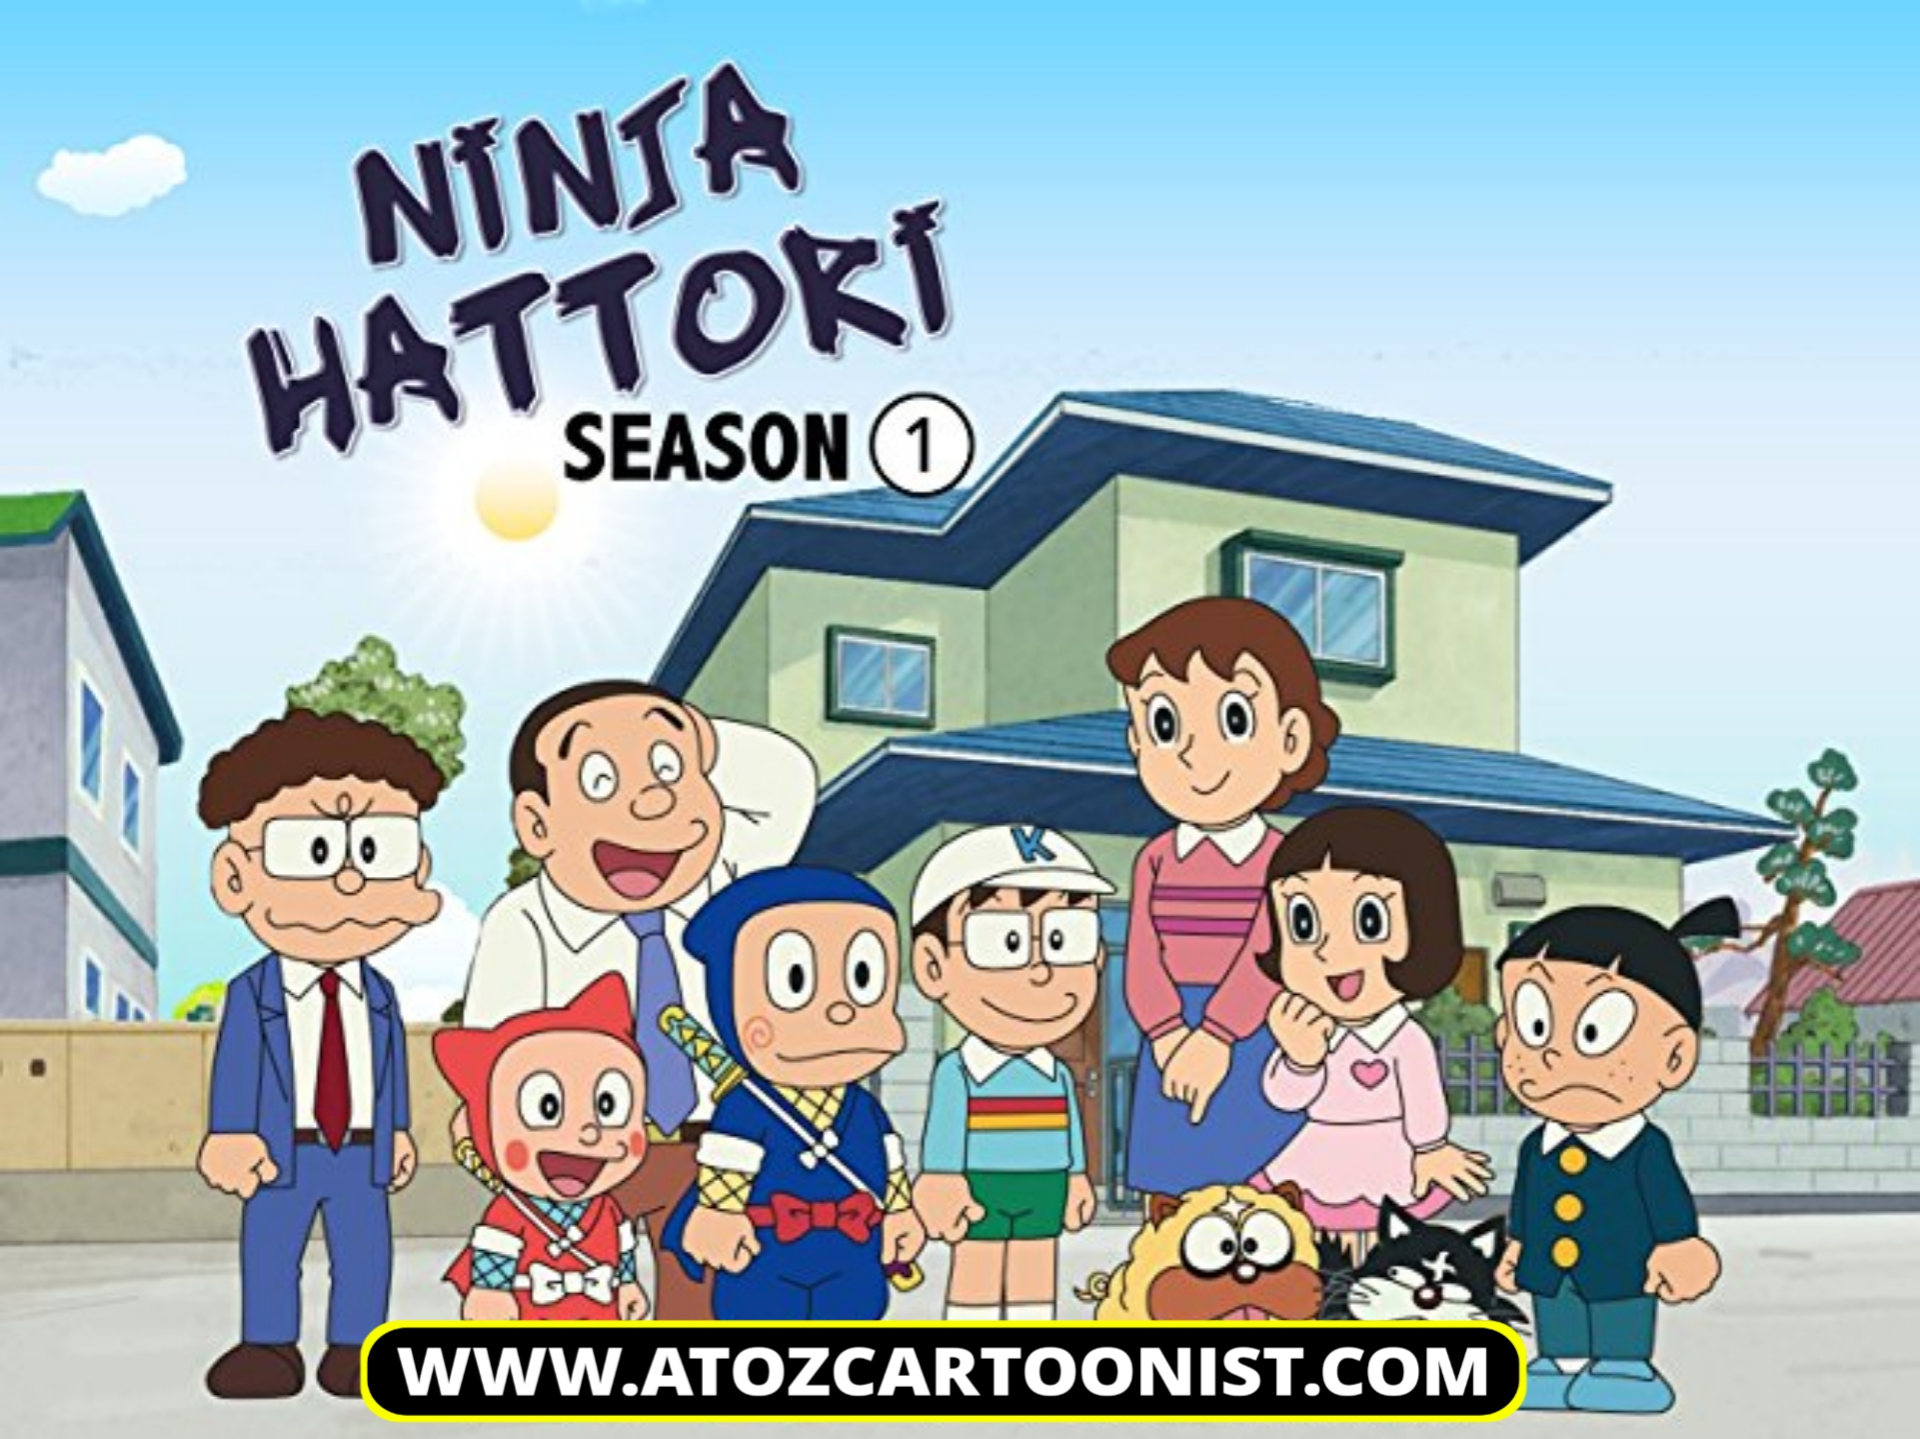 NINJA HATTORI : SEASON 01 ALL EPISODES IN HINDI – ENGLISH – TAMIL – TELUGU DOWNLOAD (576P AMZN WEB-DL)